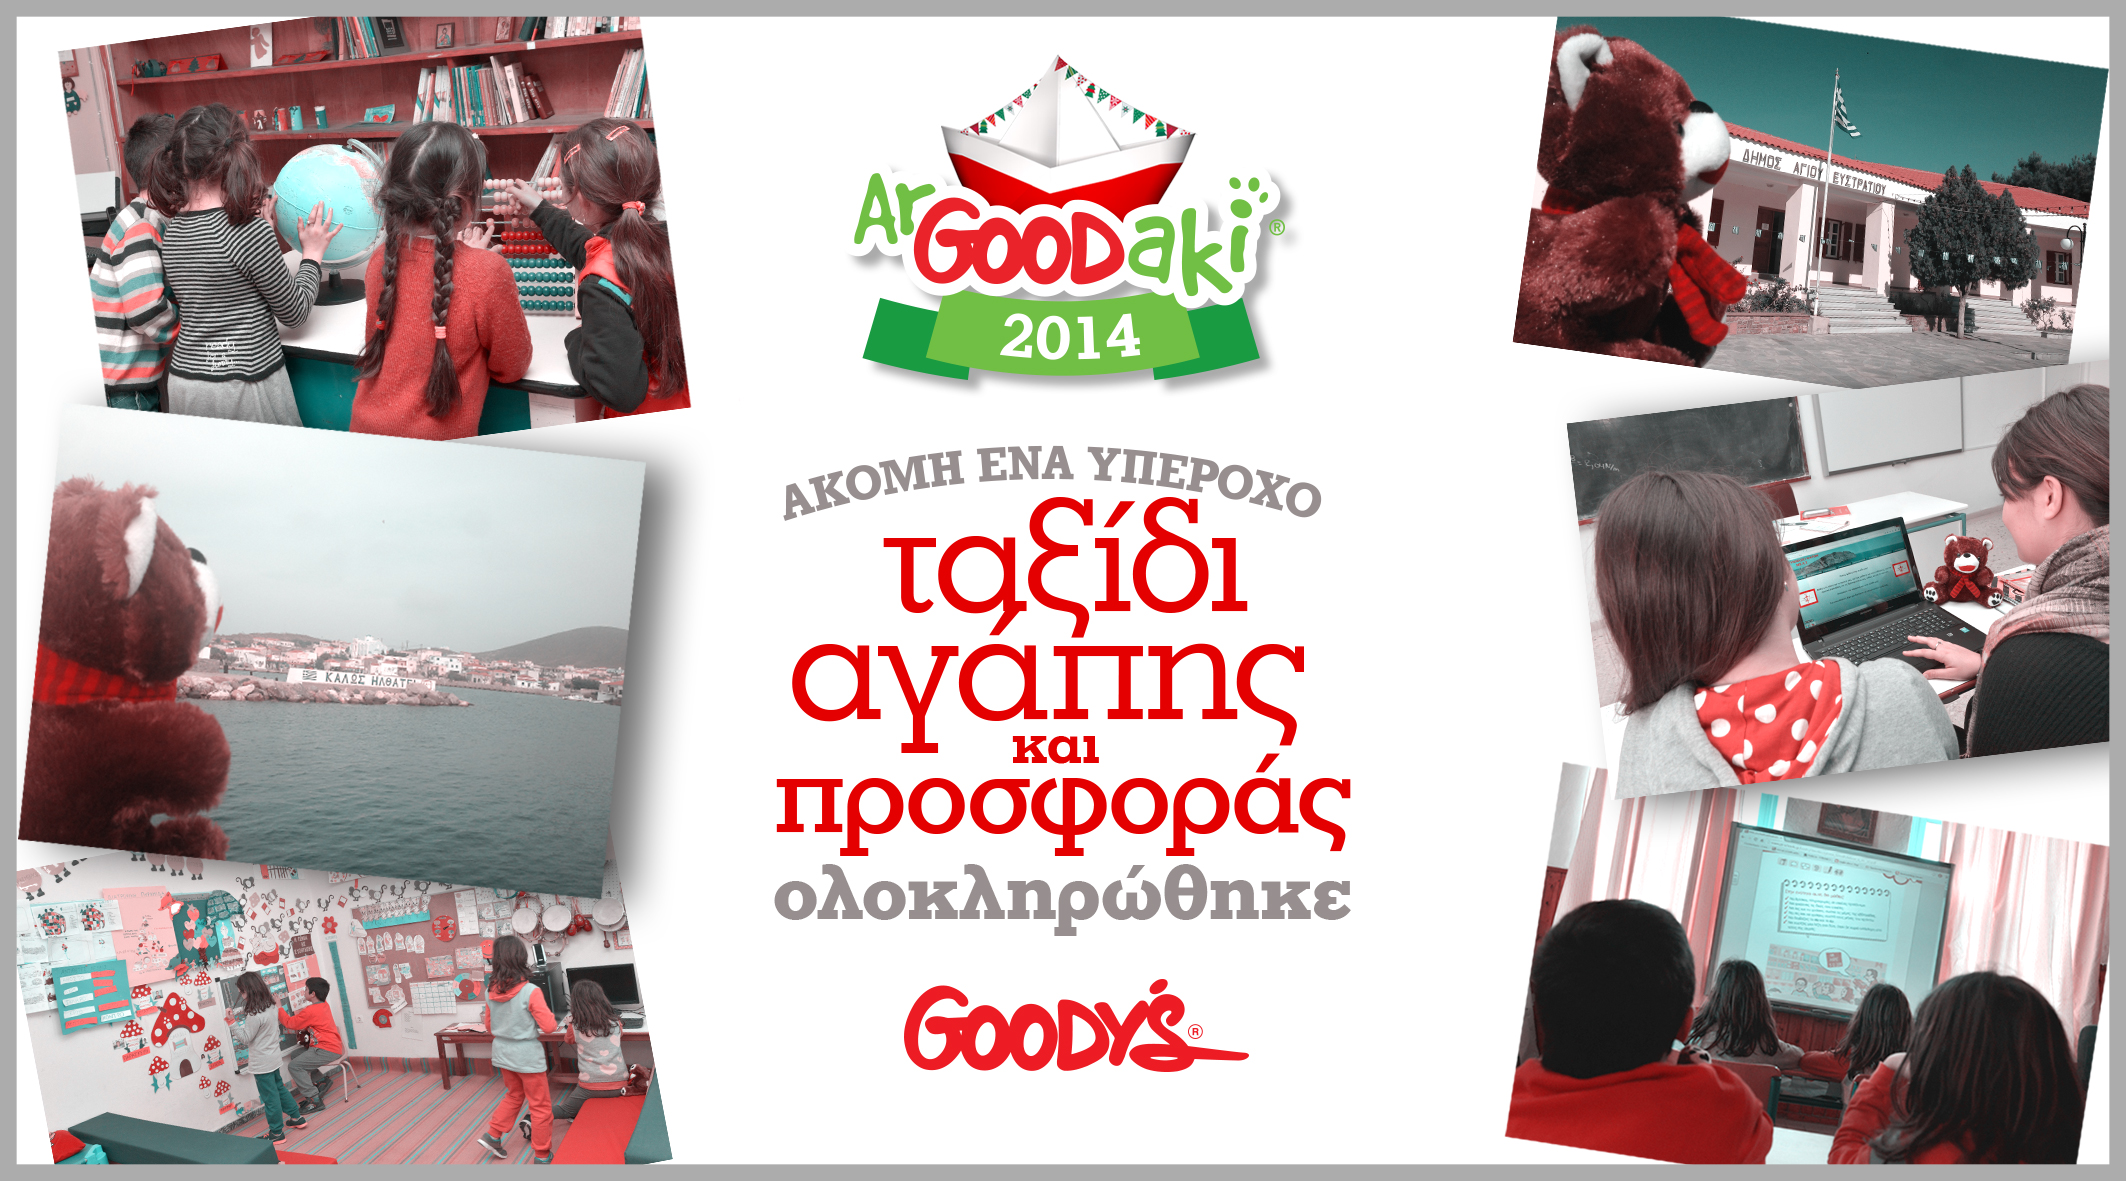 ArGOODaki 2014_1